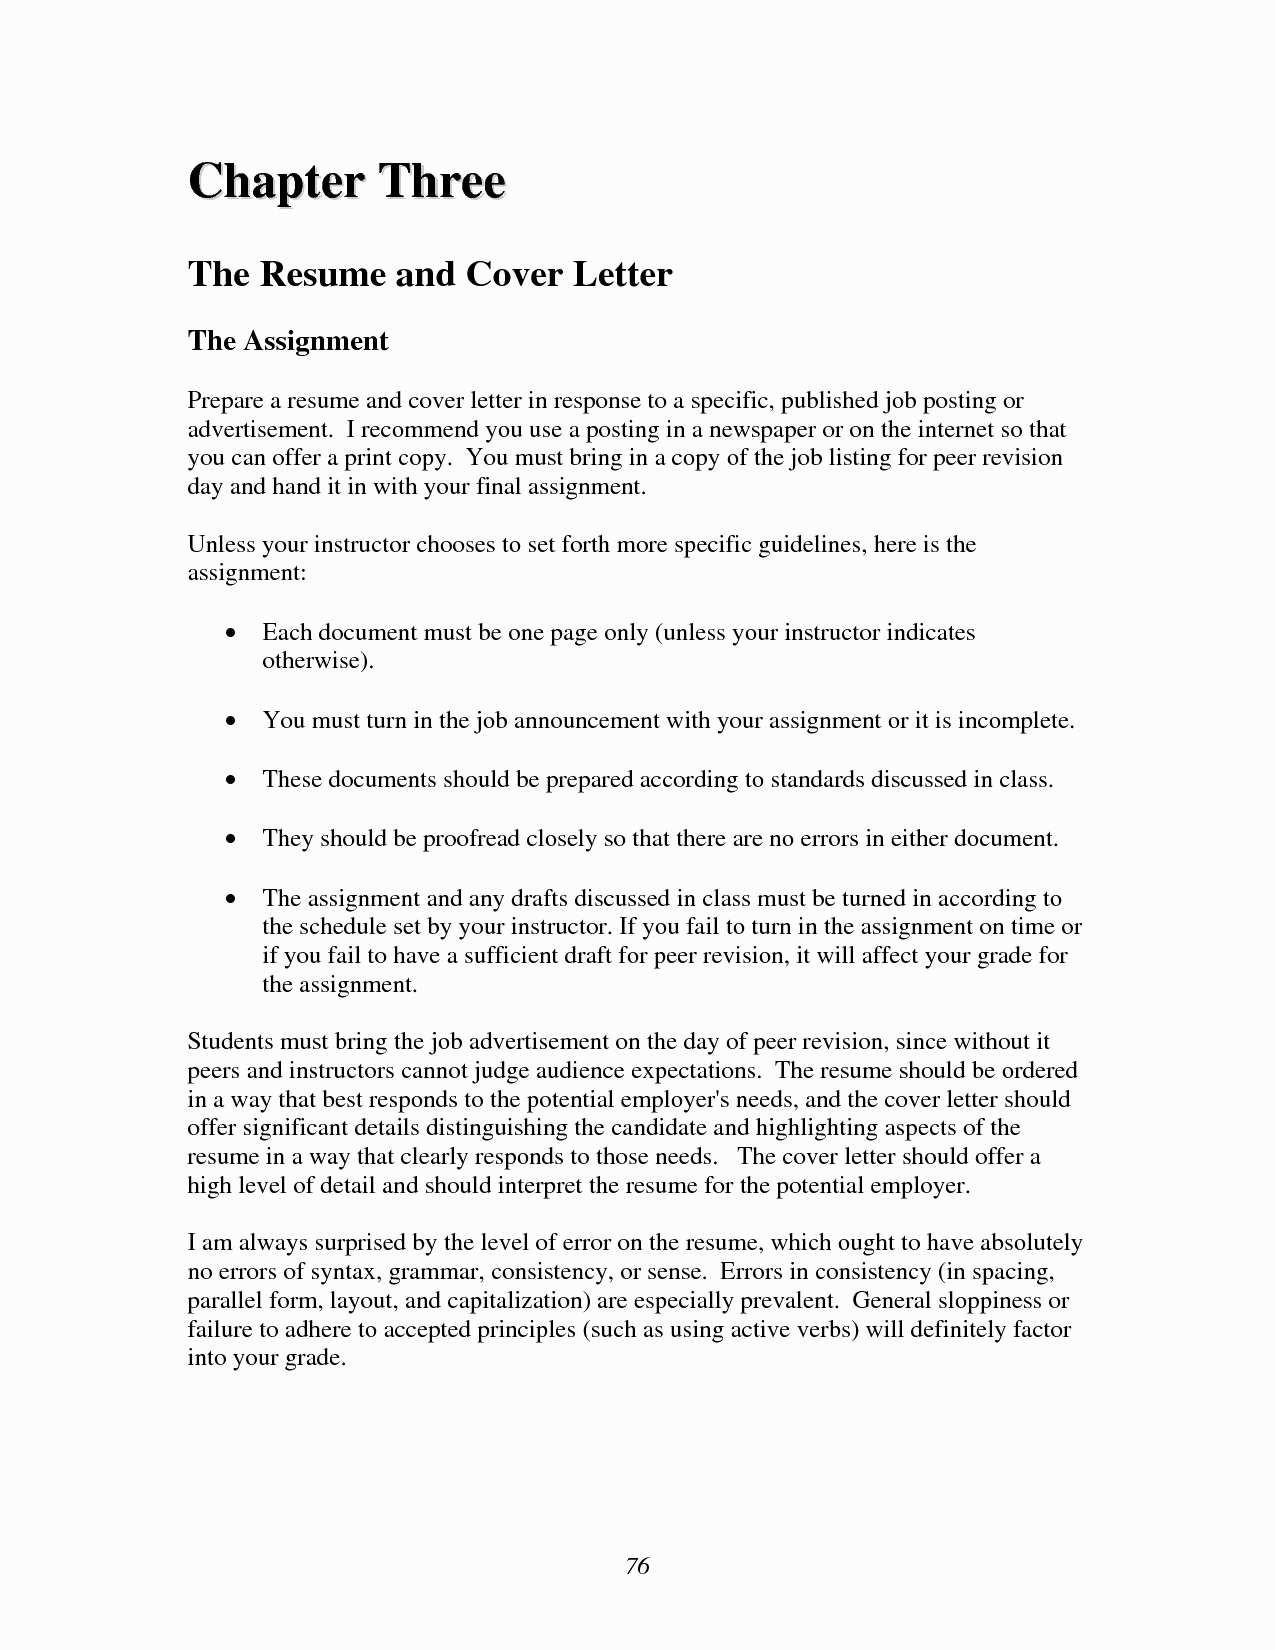 Formal Job Offer Letter Template - Cpt Job Fer Letter Sample Valid Job Fer Letter Template Us Copy Od